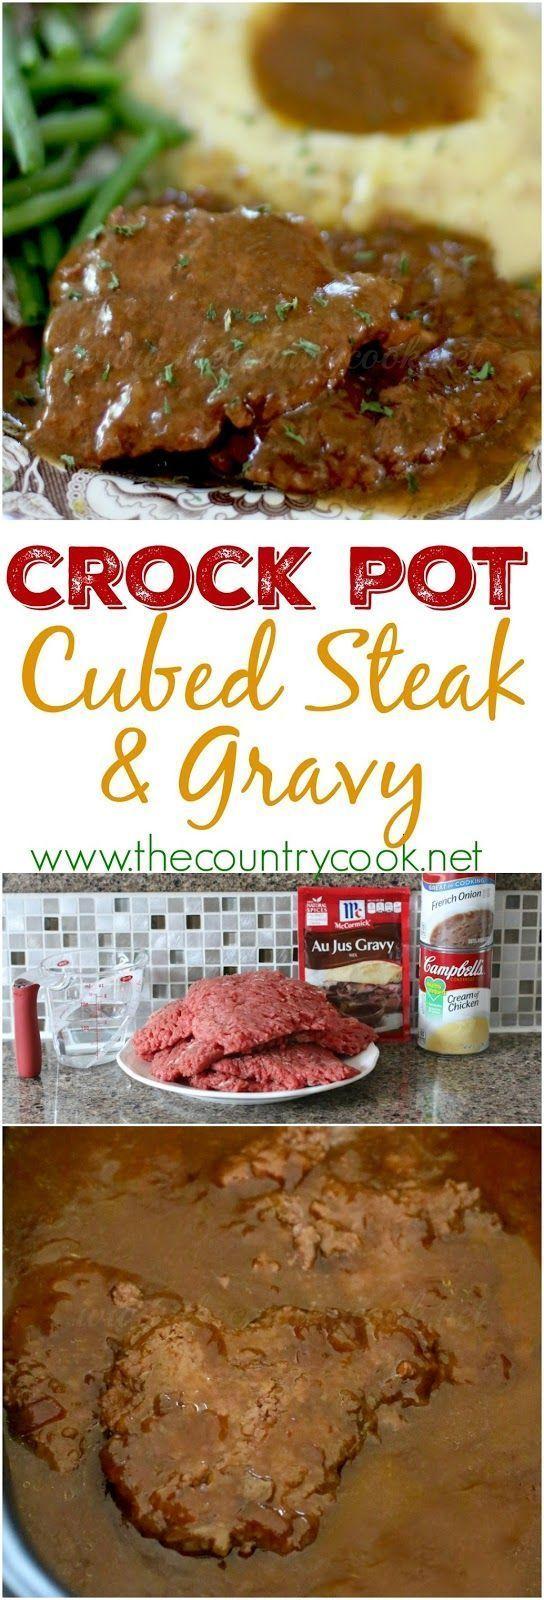 Crock Pot Cubed Steak With Gravy Recipe